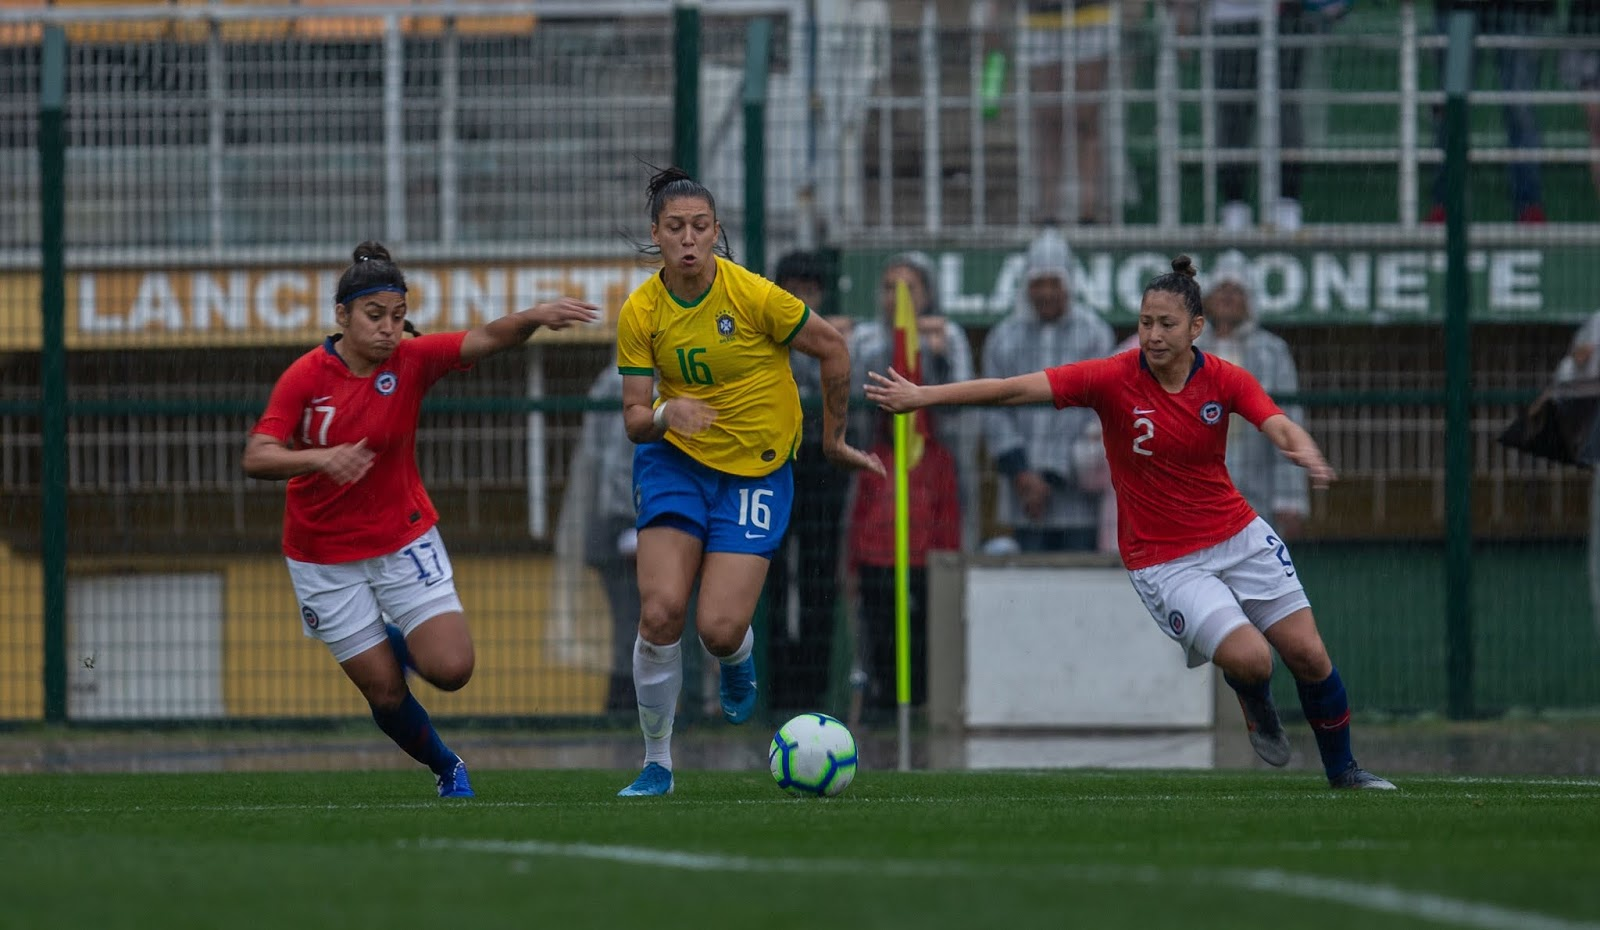 Brasil y Chile en Torneio Uber Internacional de Futebol Feminino de Seleções, 1 de septiembre de 2019